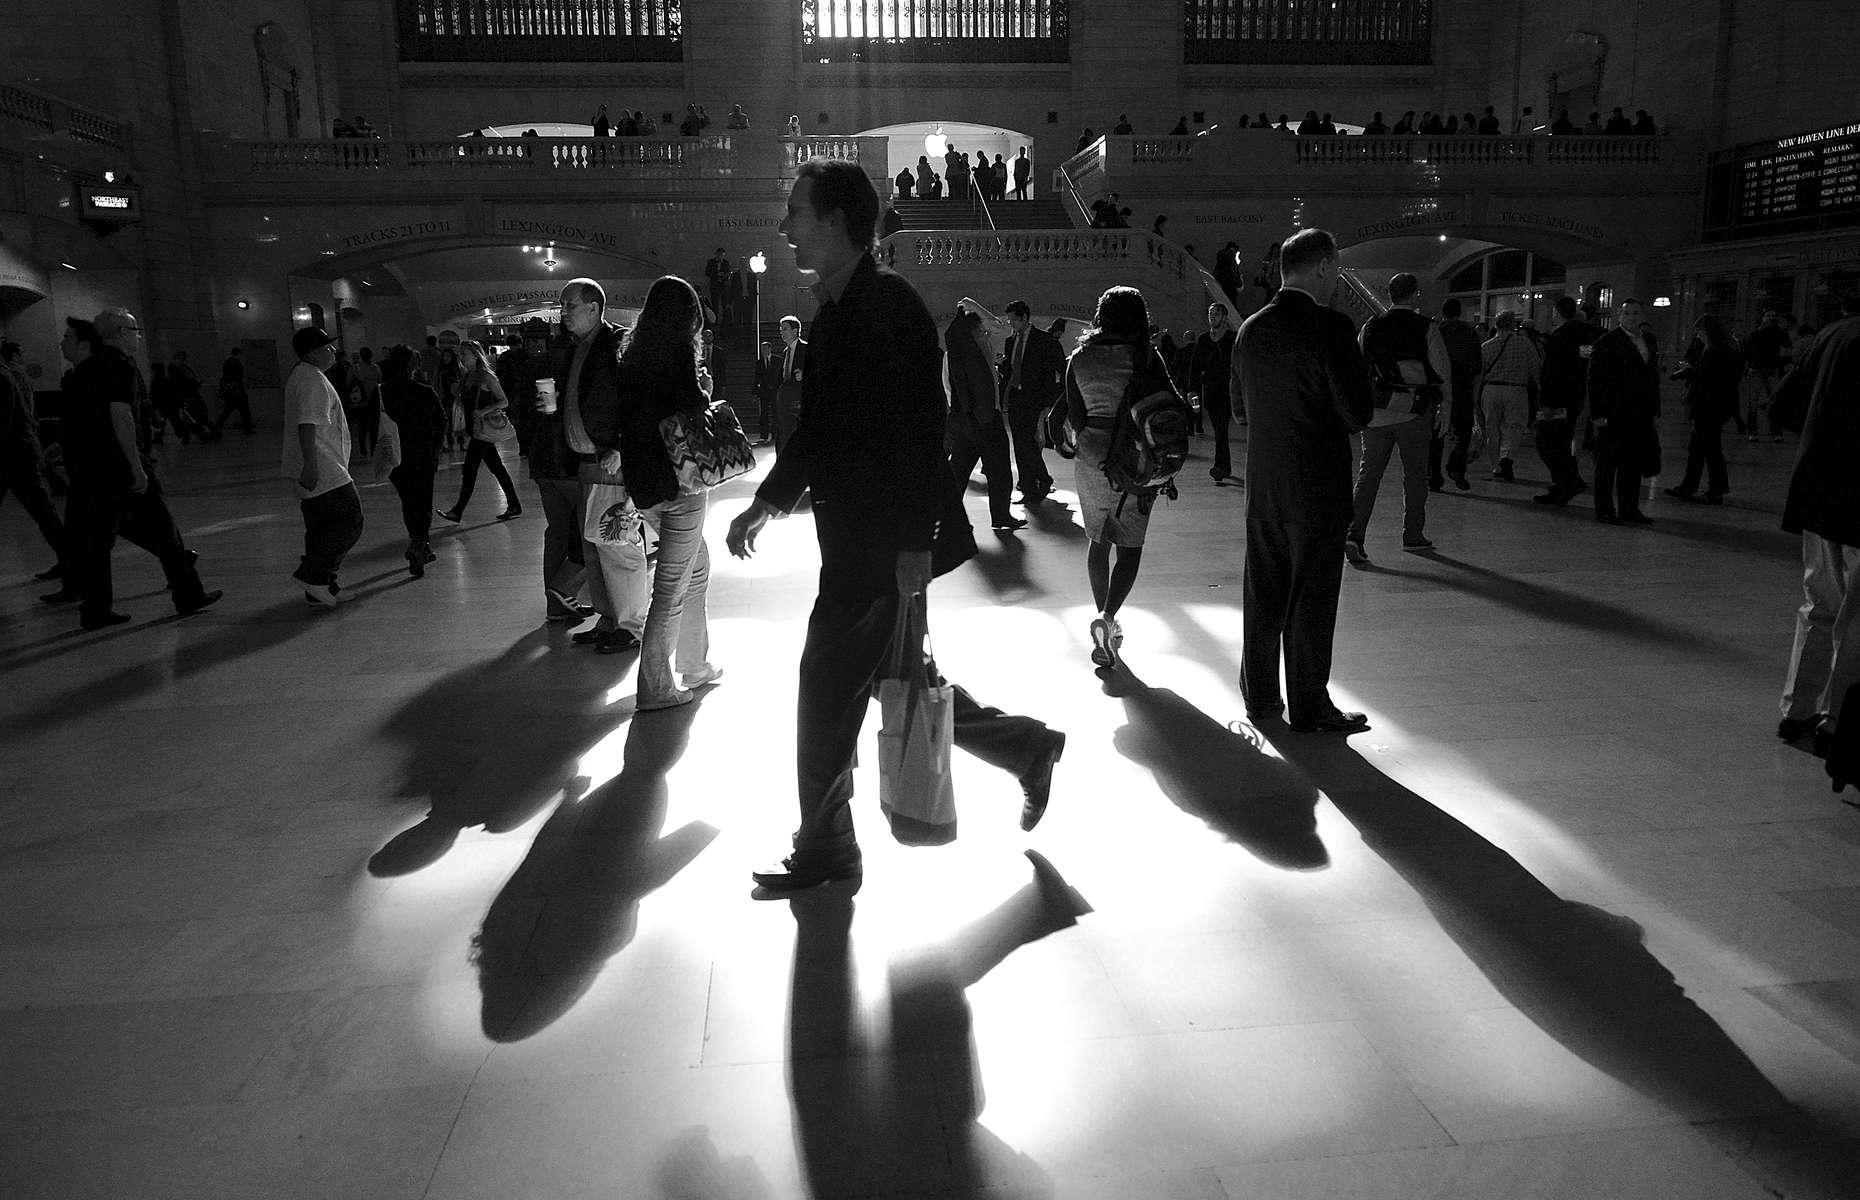 Grand Central Terminal - September, 2013